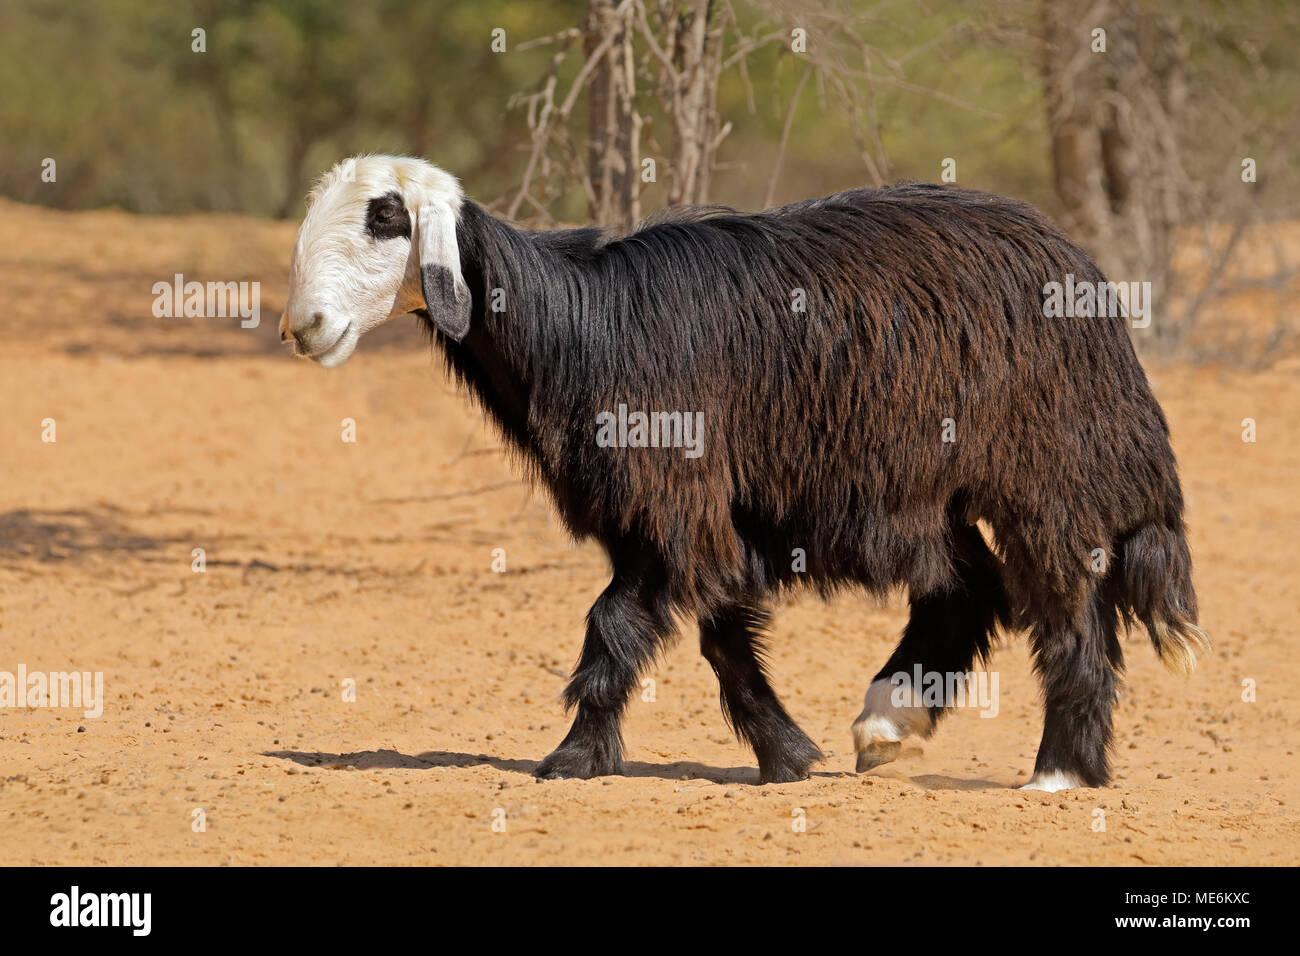 Arabian Nadji - domestic sheep breed of the Najd region of the Arabian Peninsula Stock Photo